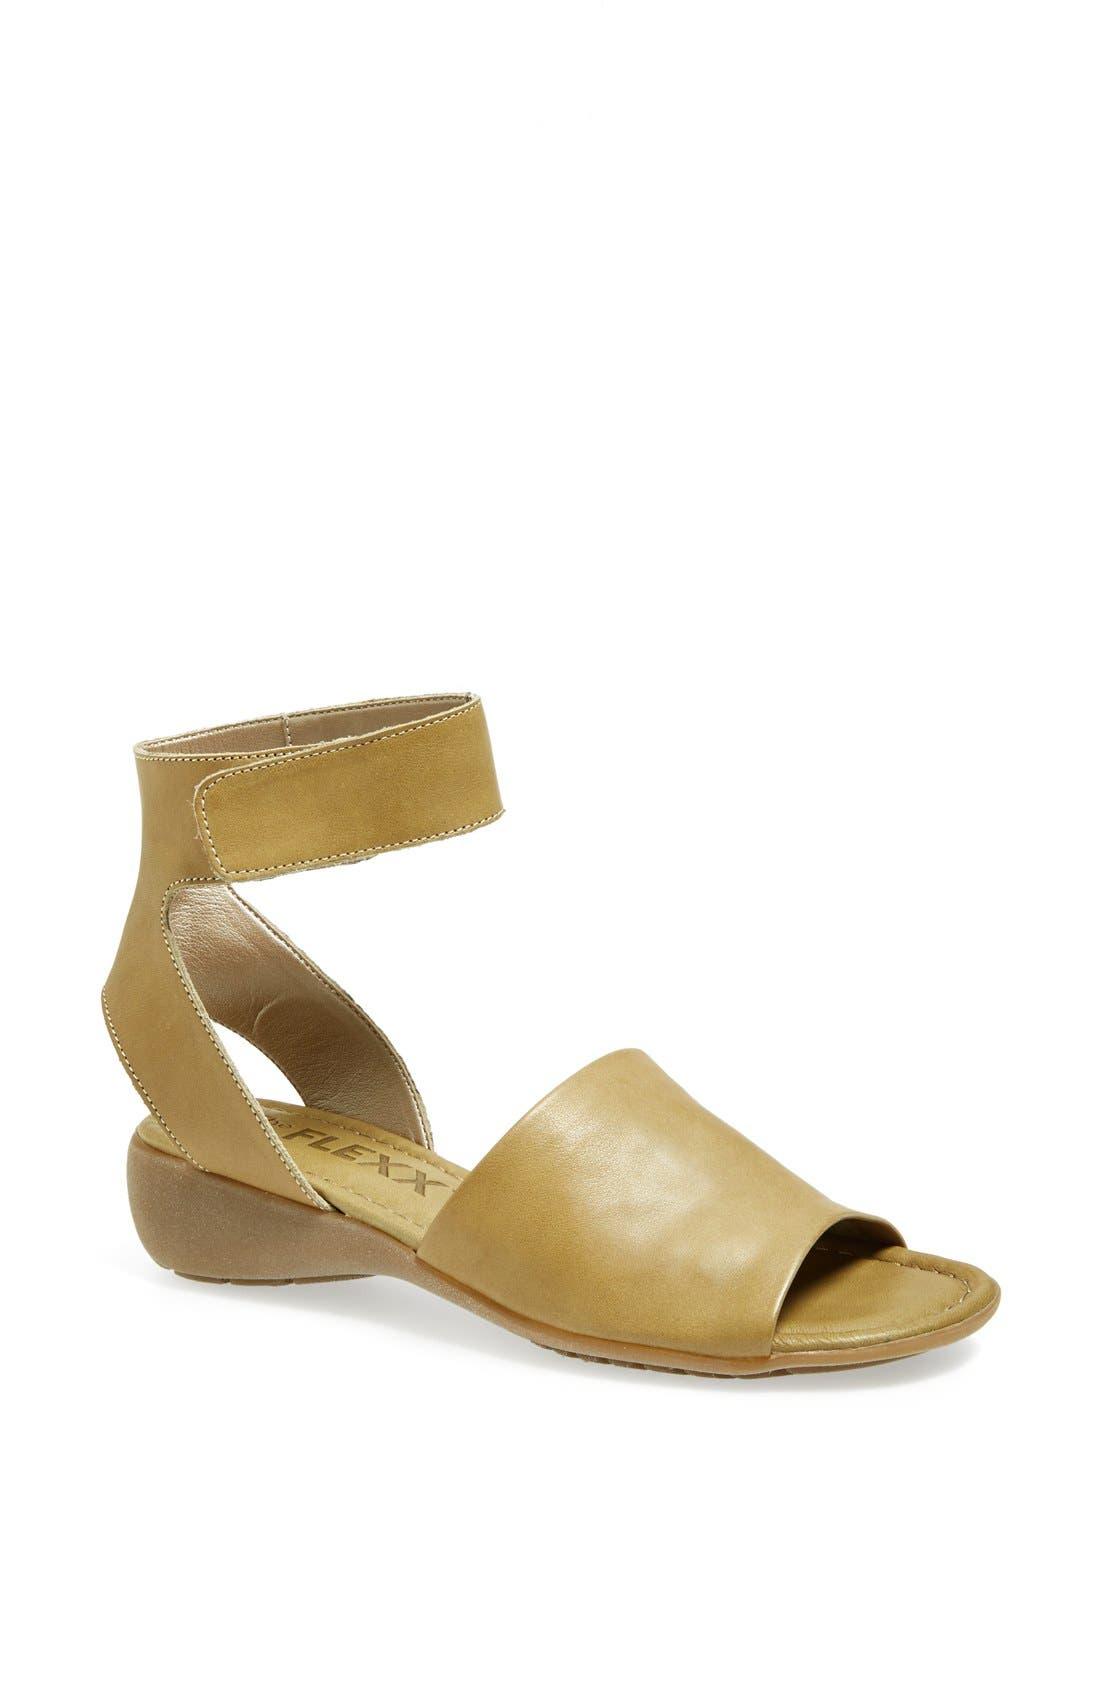 'Beglad' Leather Ankle Strap Sandal,                             Main thumbnail 13, color,